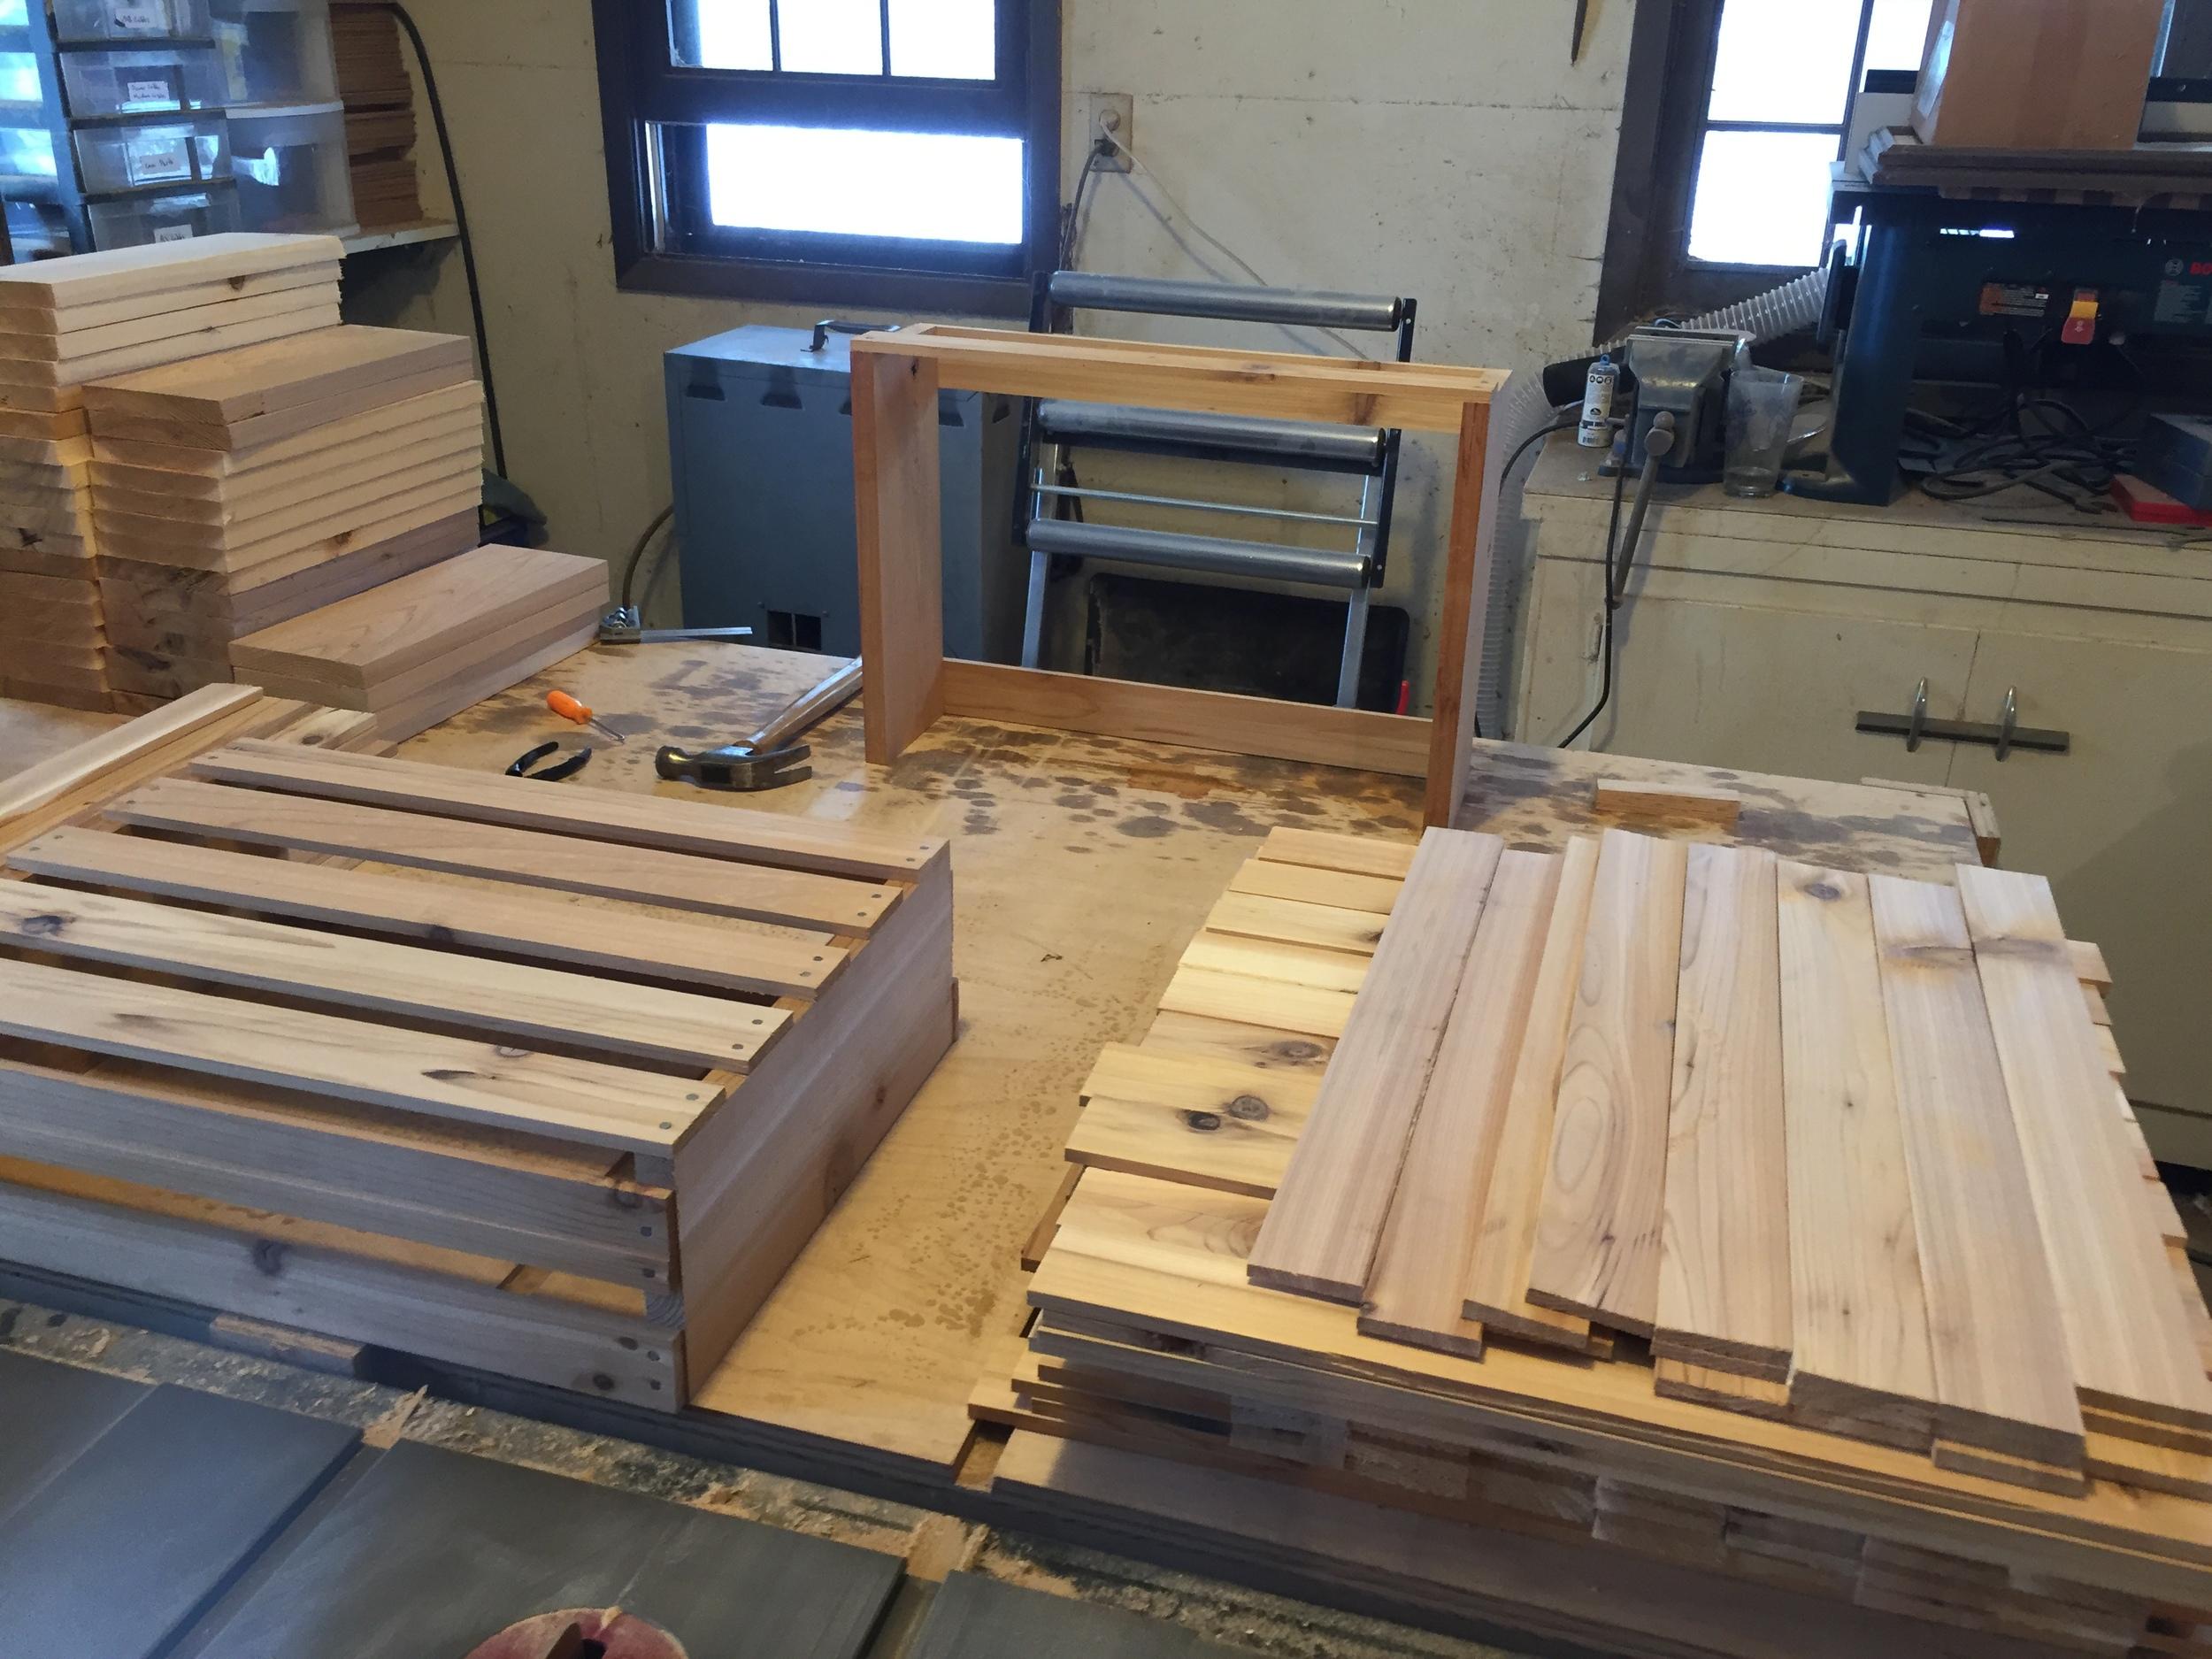 Cedar crate assembly process.